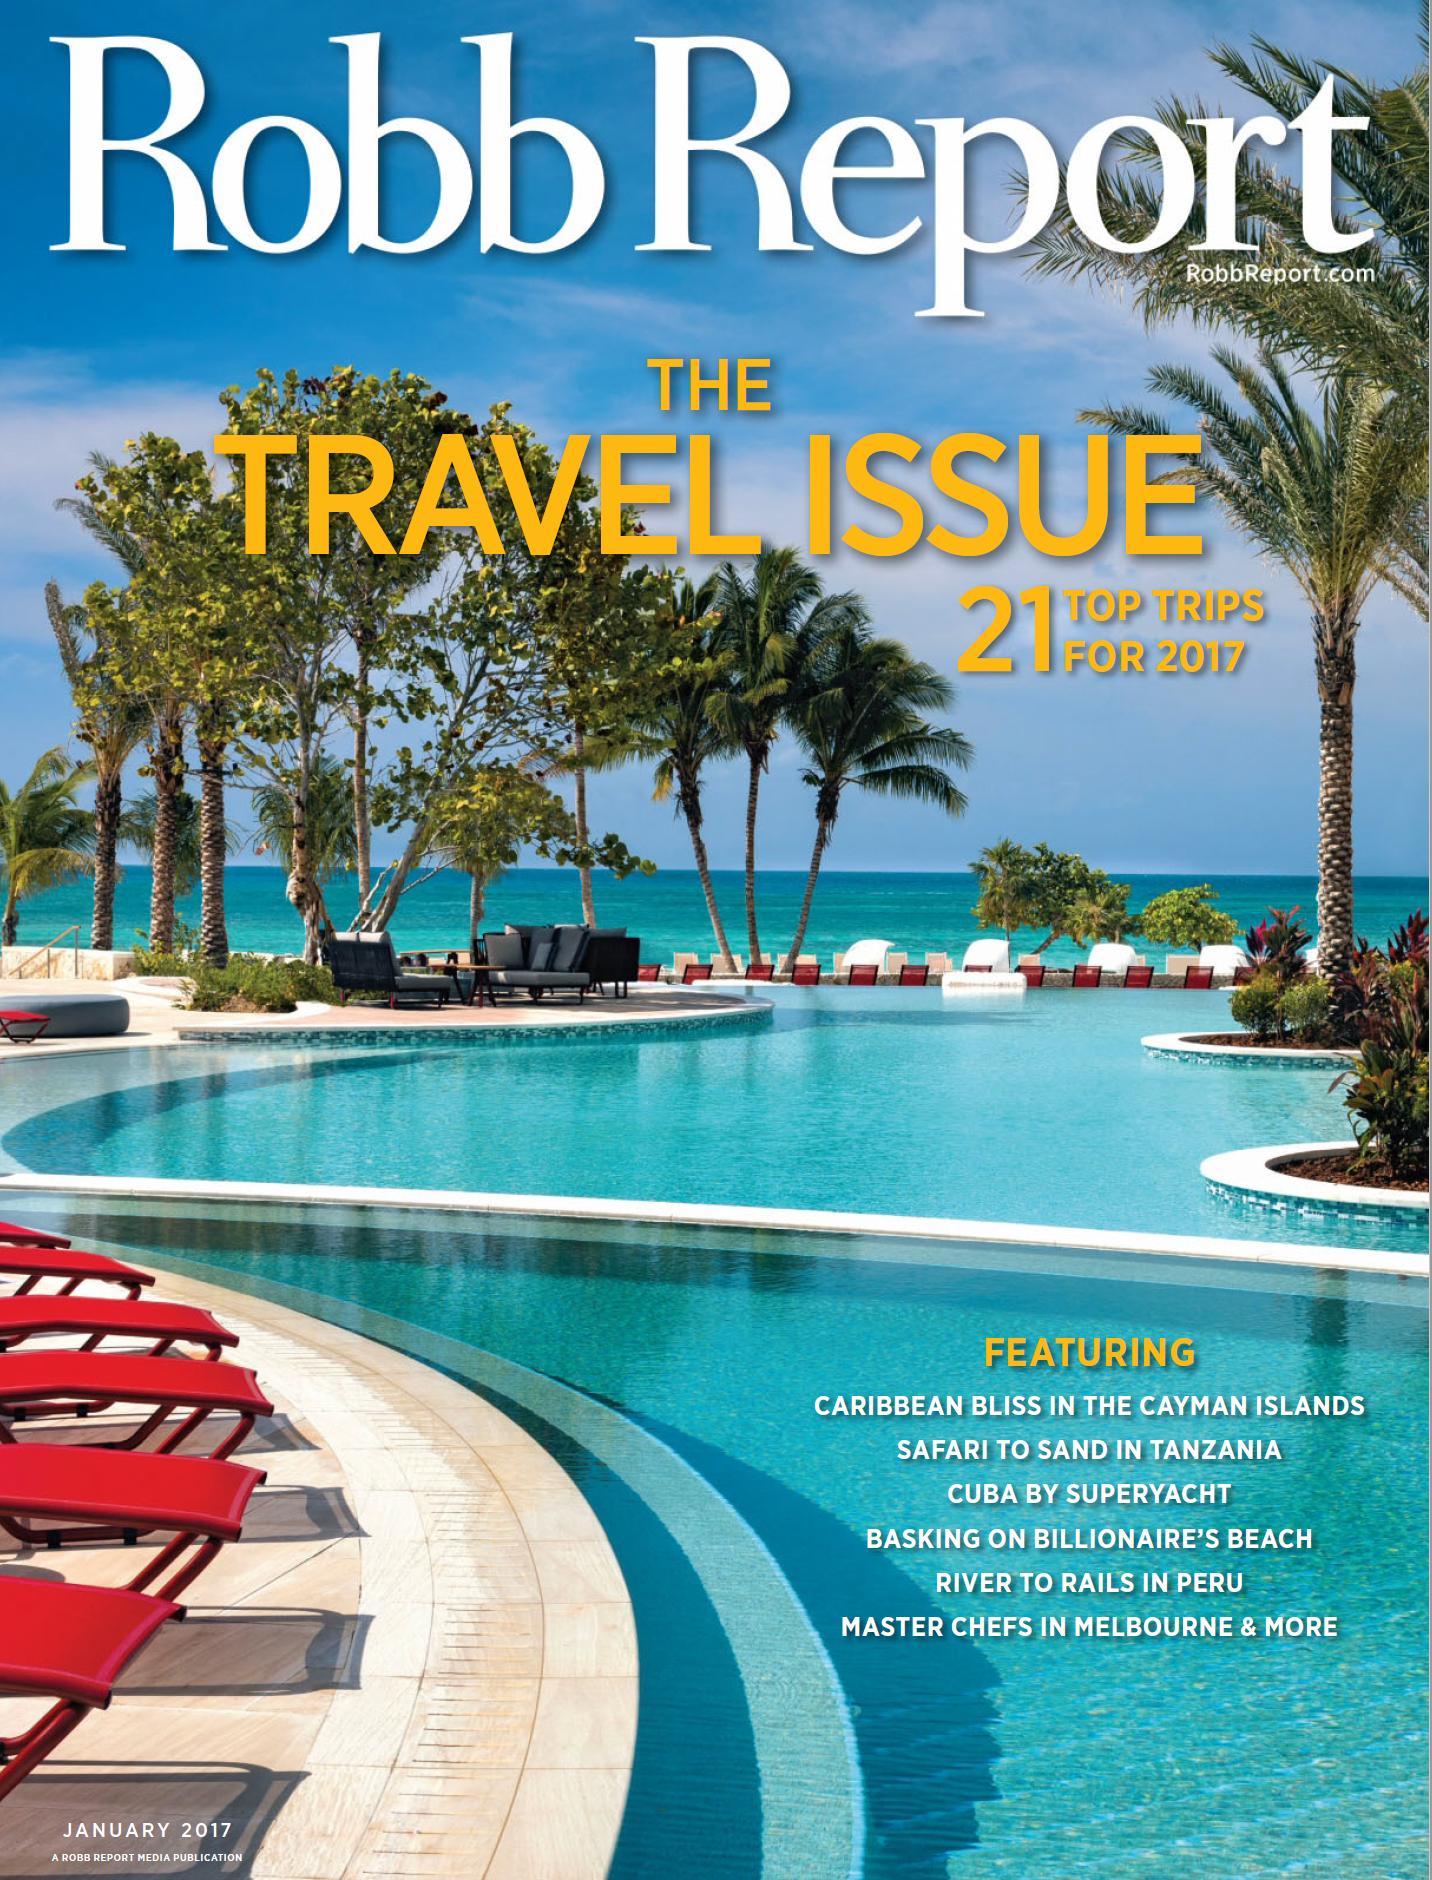 Robb Report | Travel Issue Malibu Hotel Nobu Ryokan